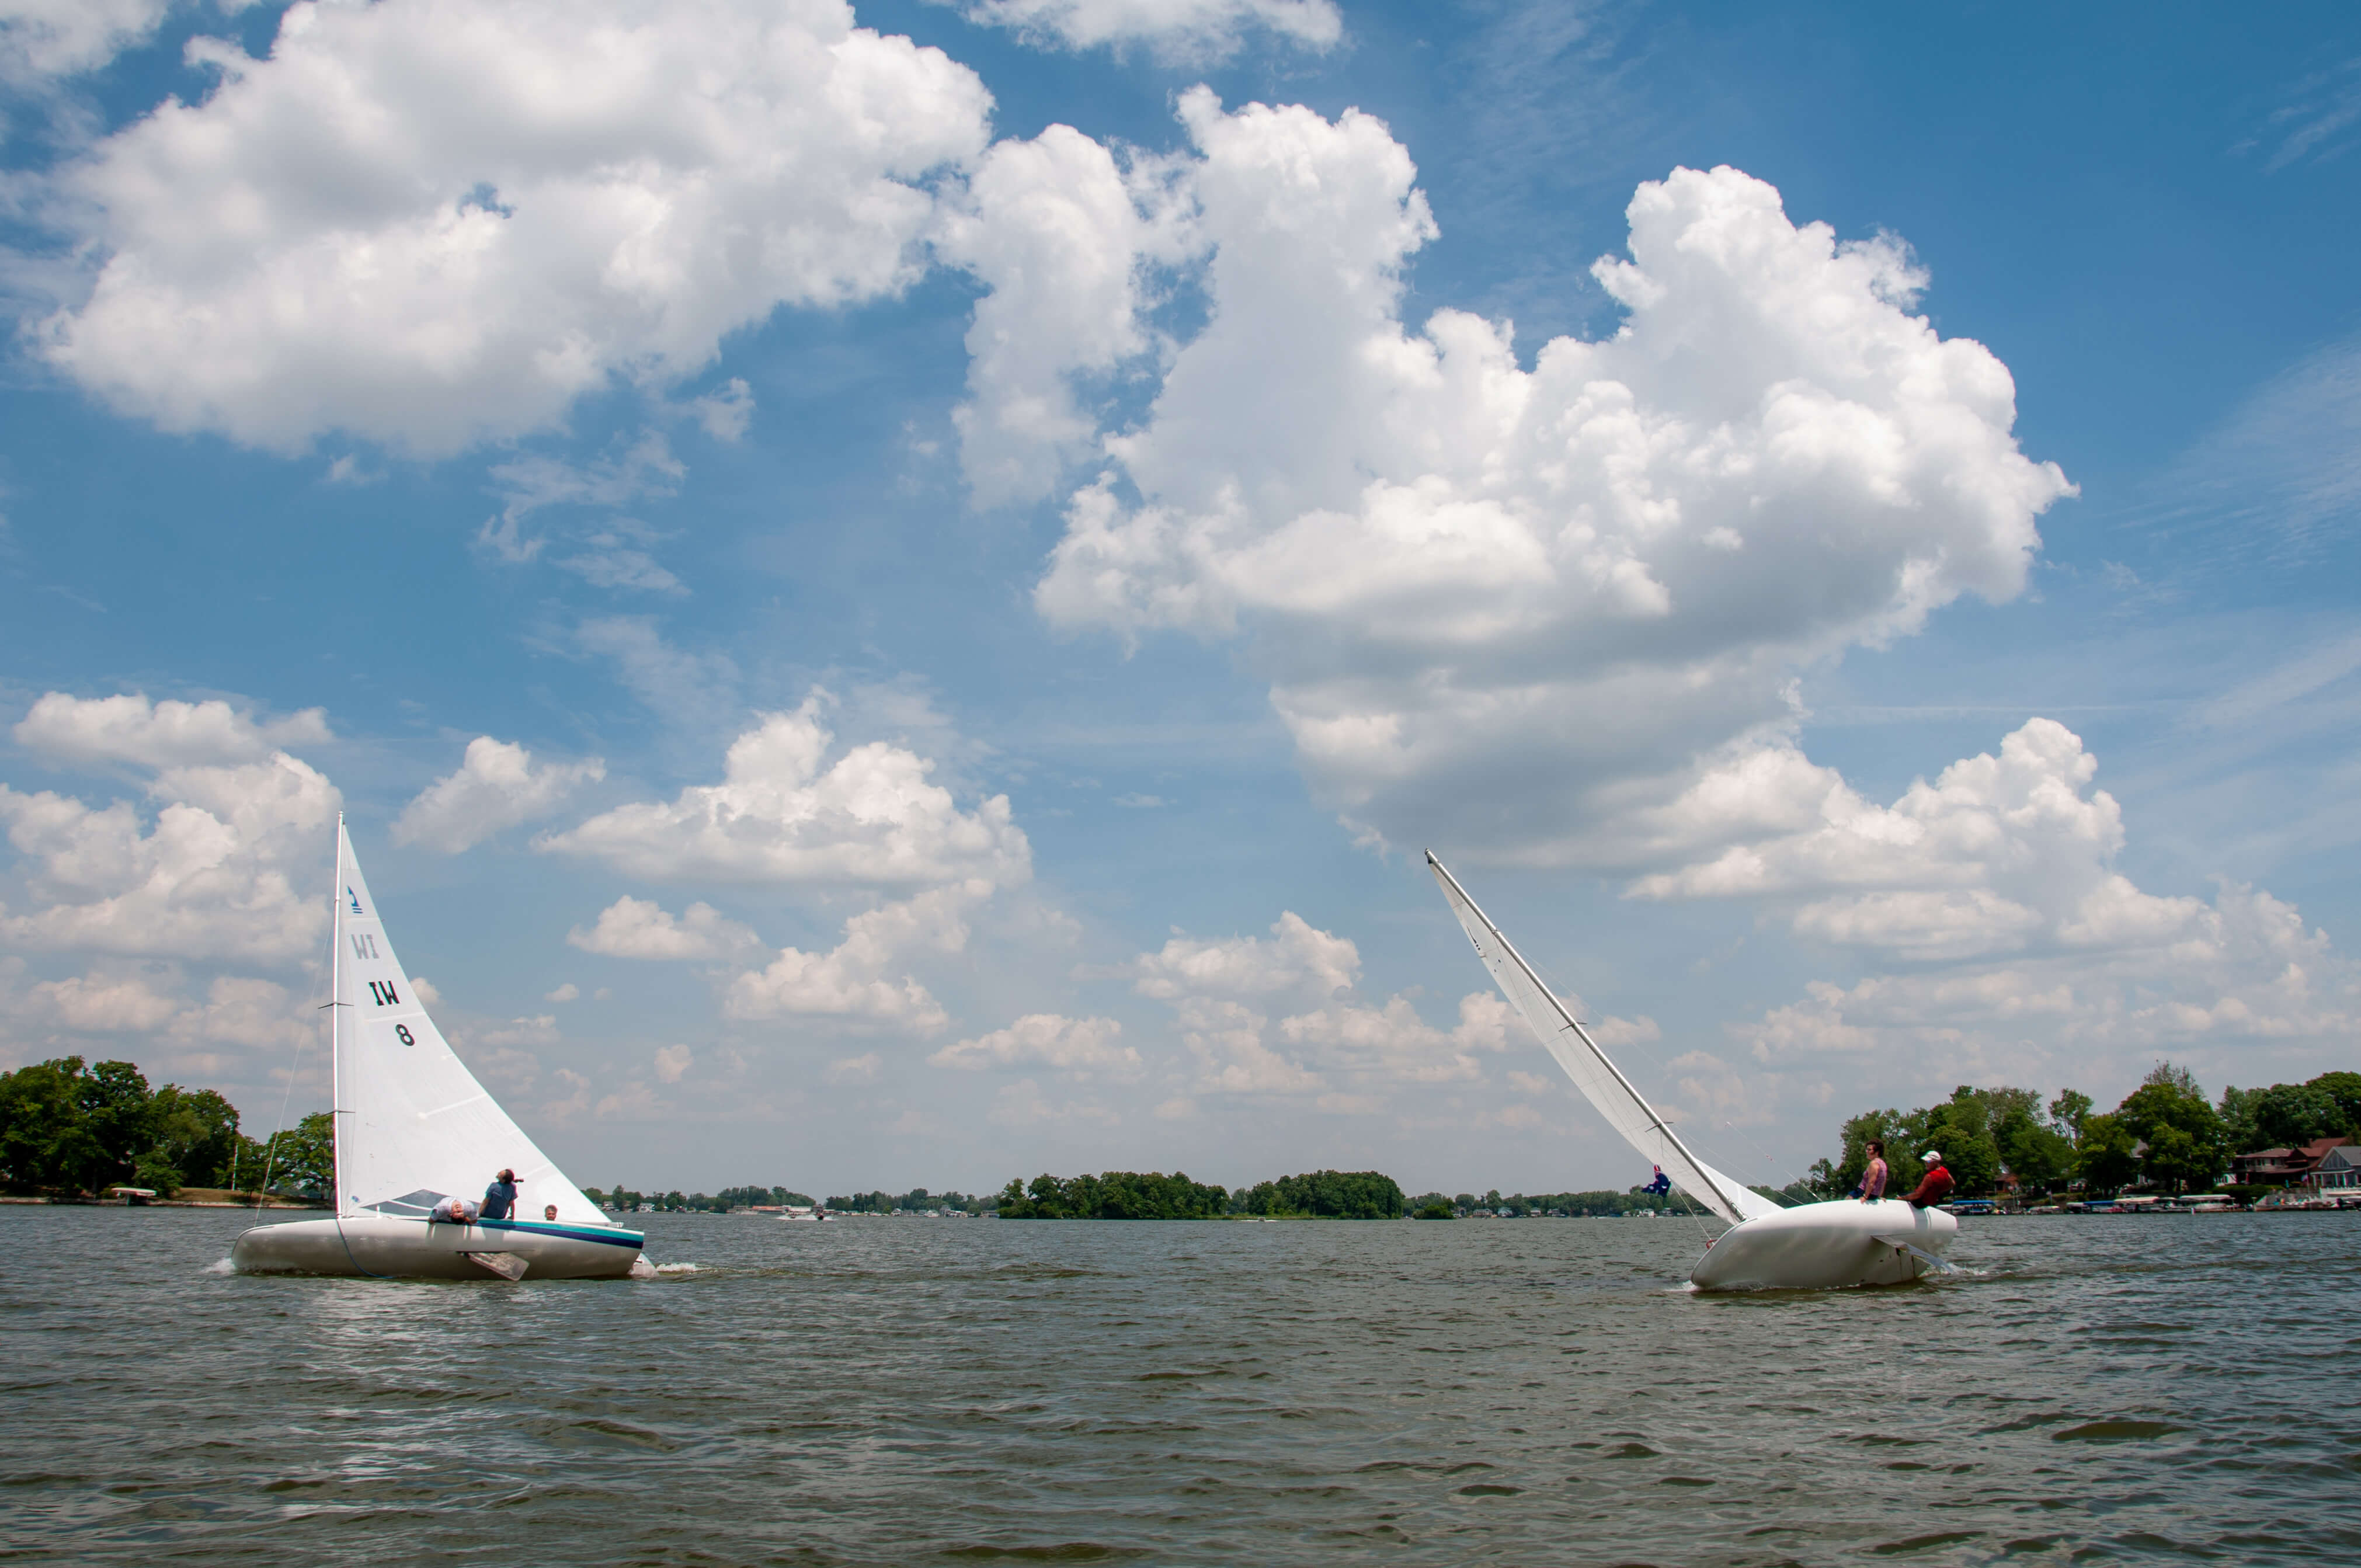 Two sailboats on a lake